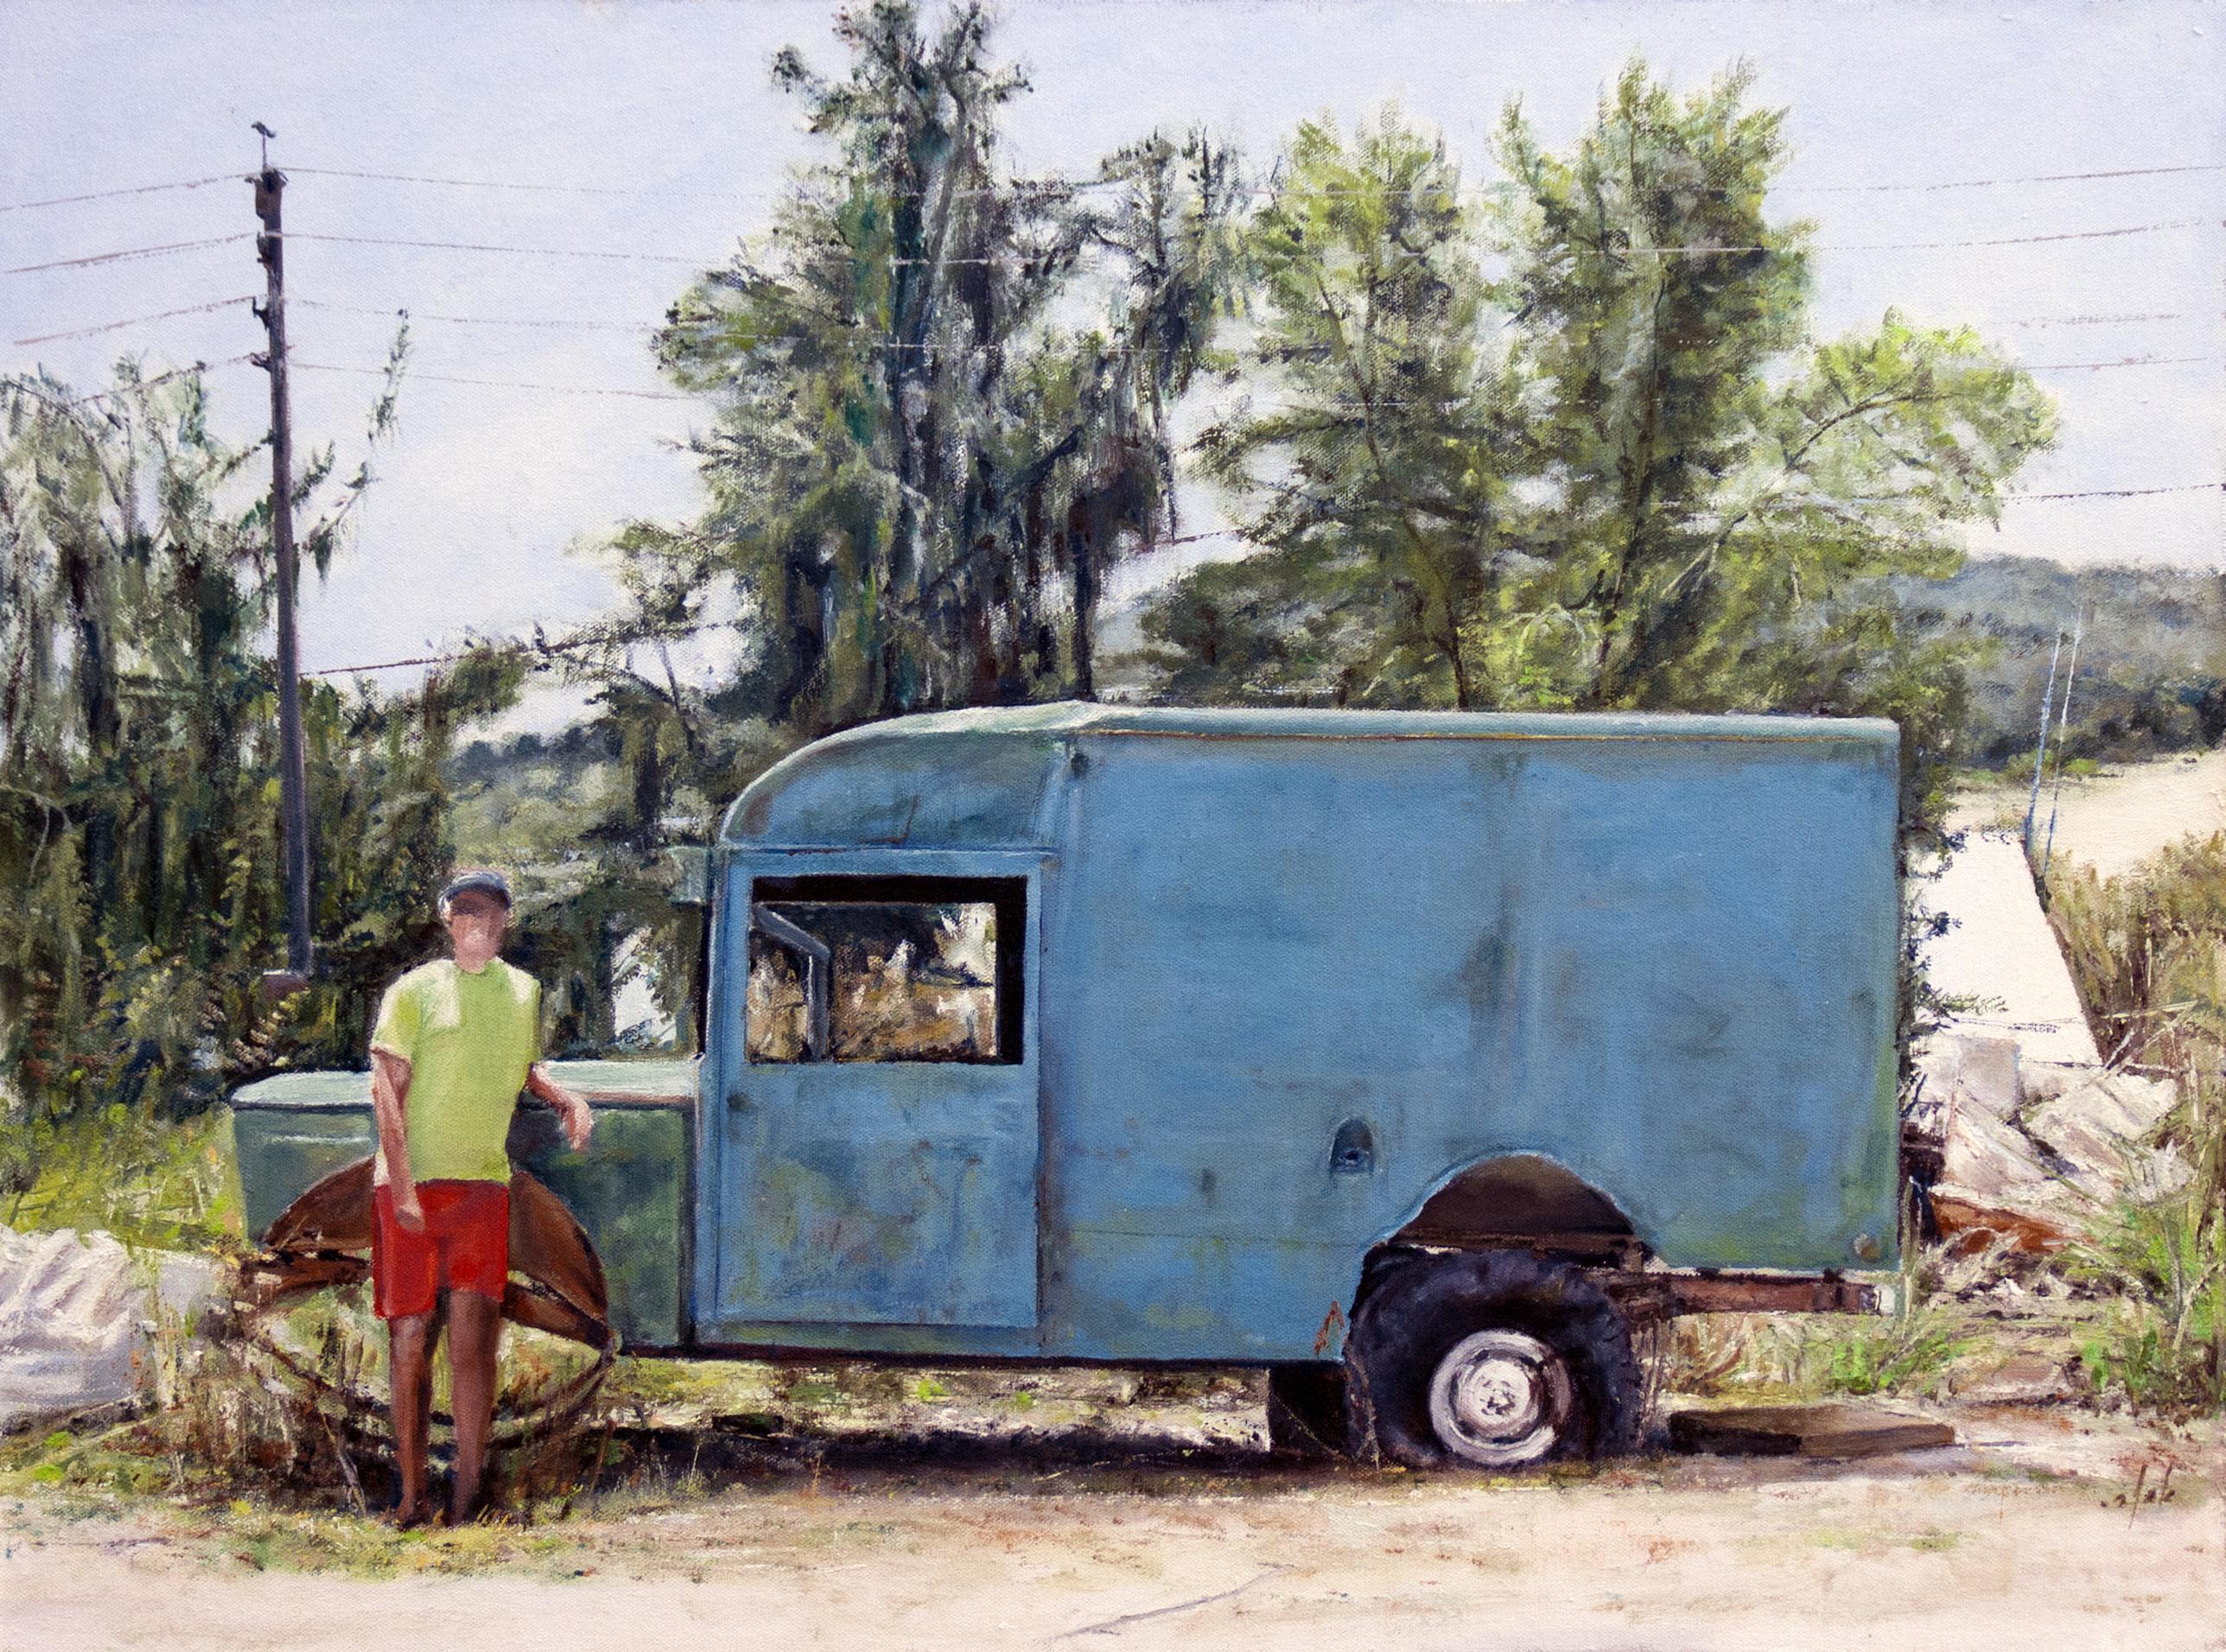 67X50 רכב הצלה וצייר